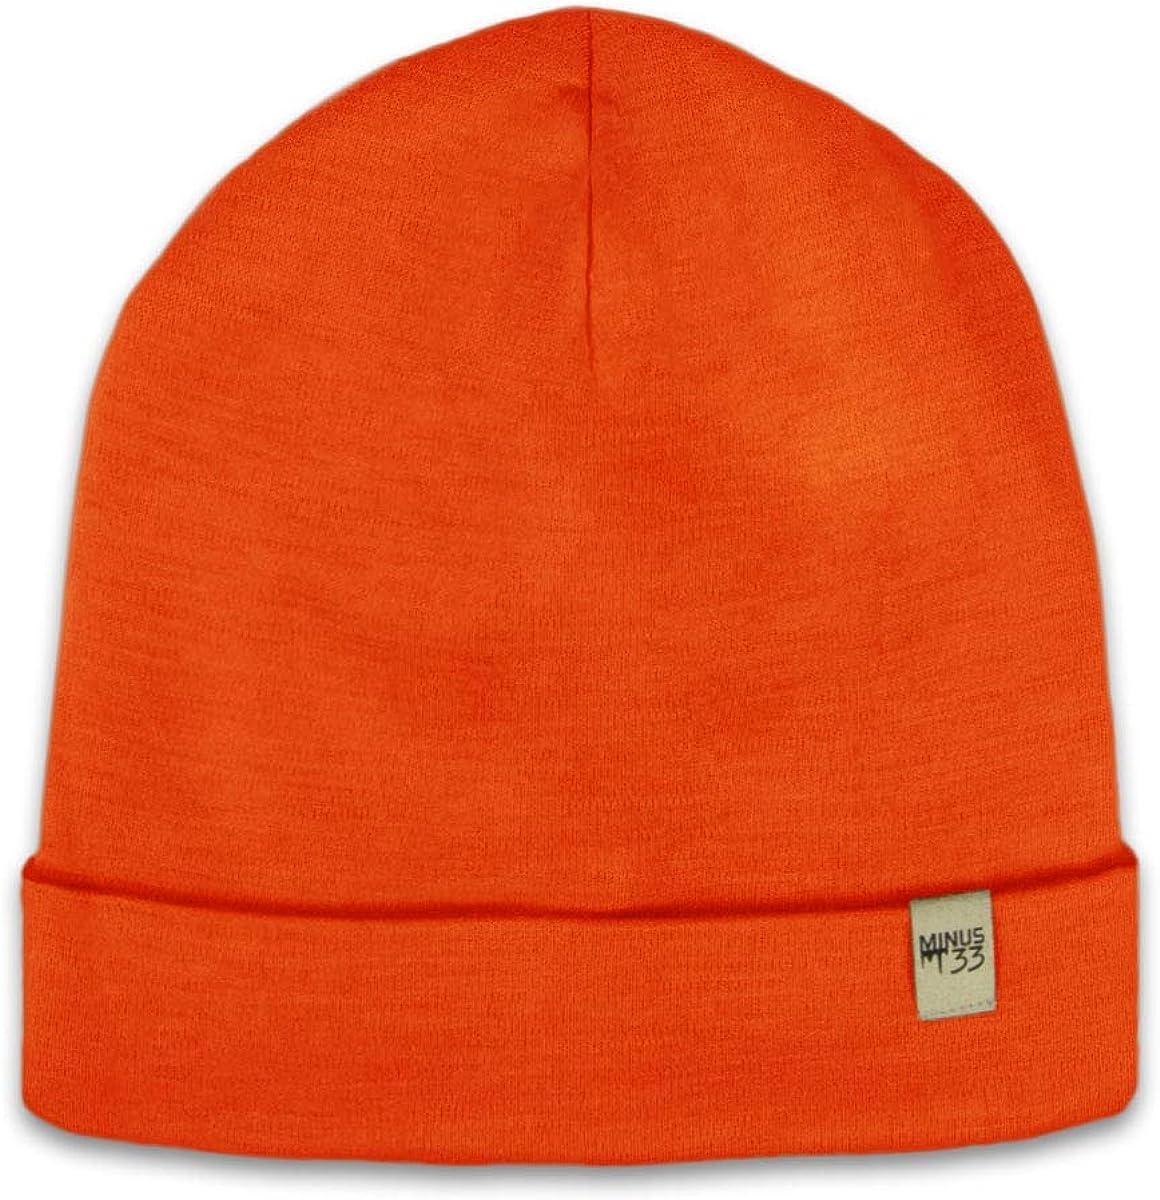 Minus33 Merino Wool Ridge Cuff Beanie Blaze Orange One Size: Clothing